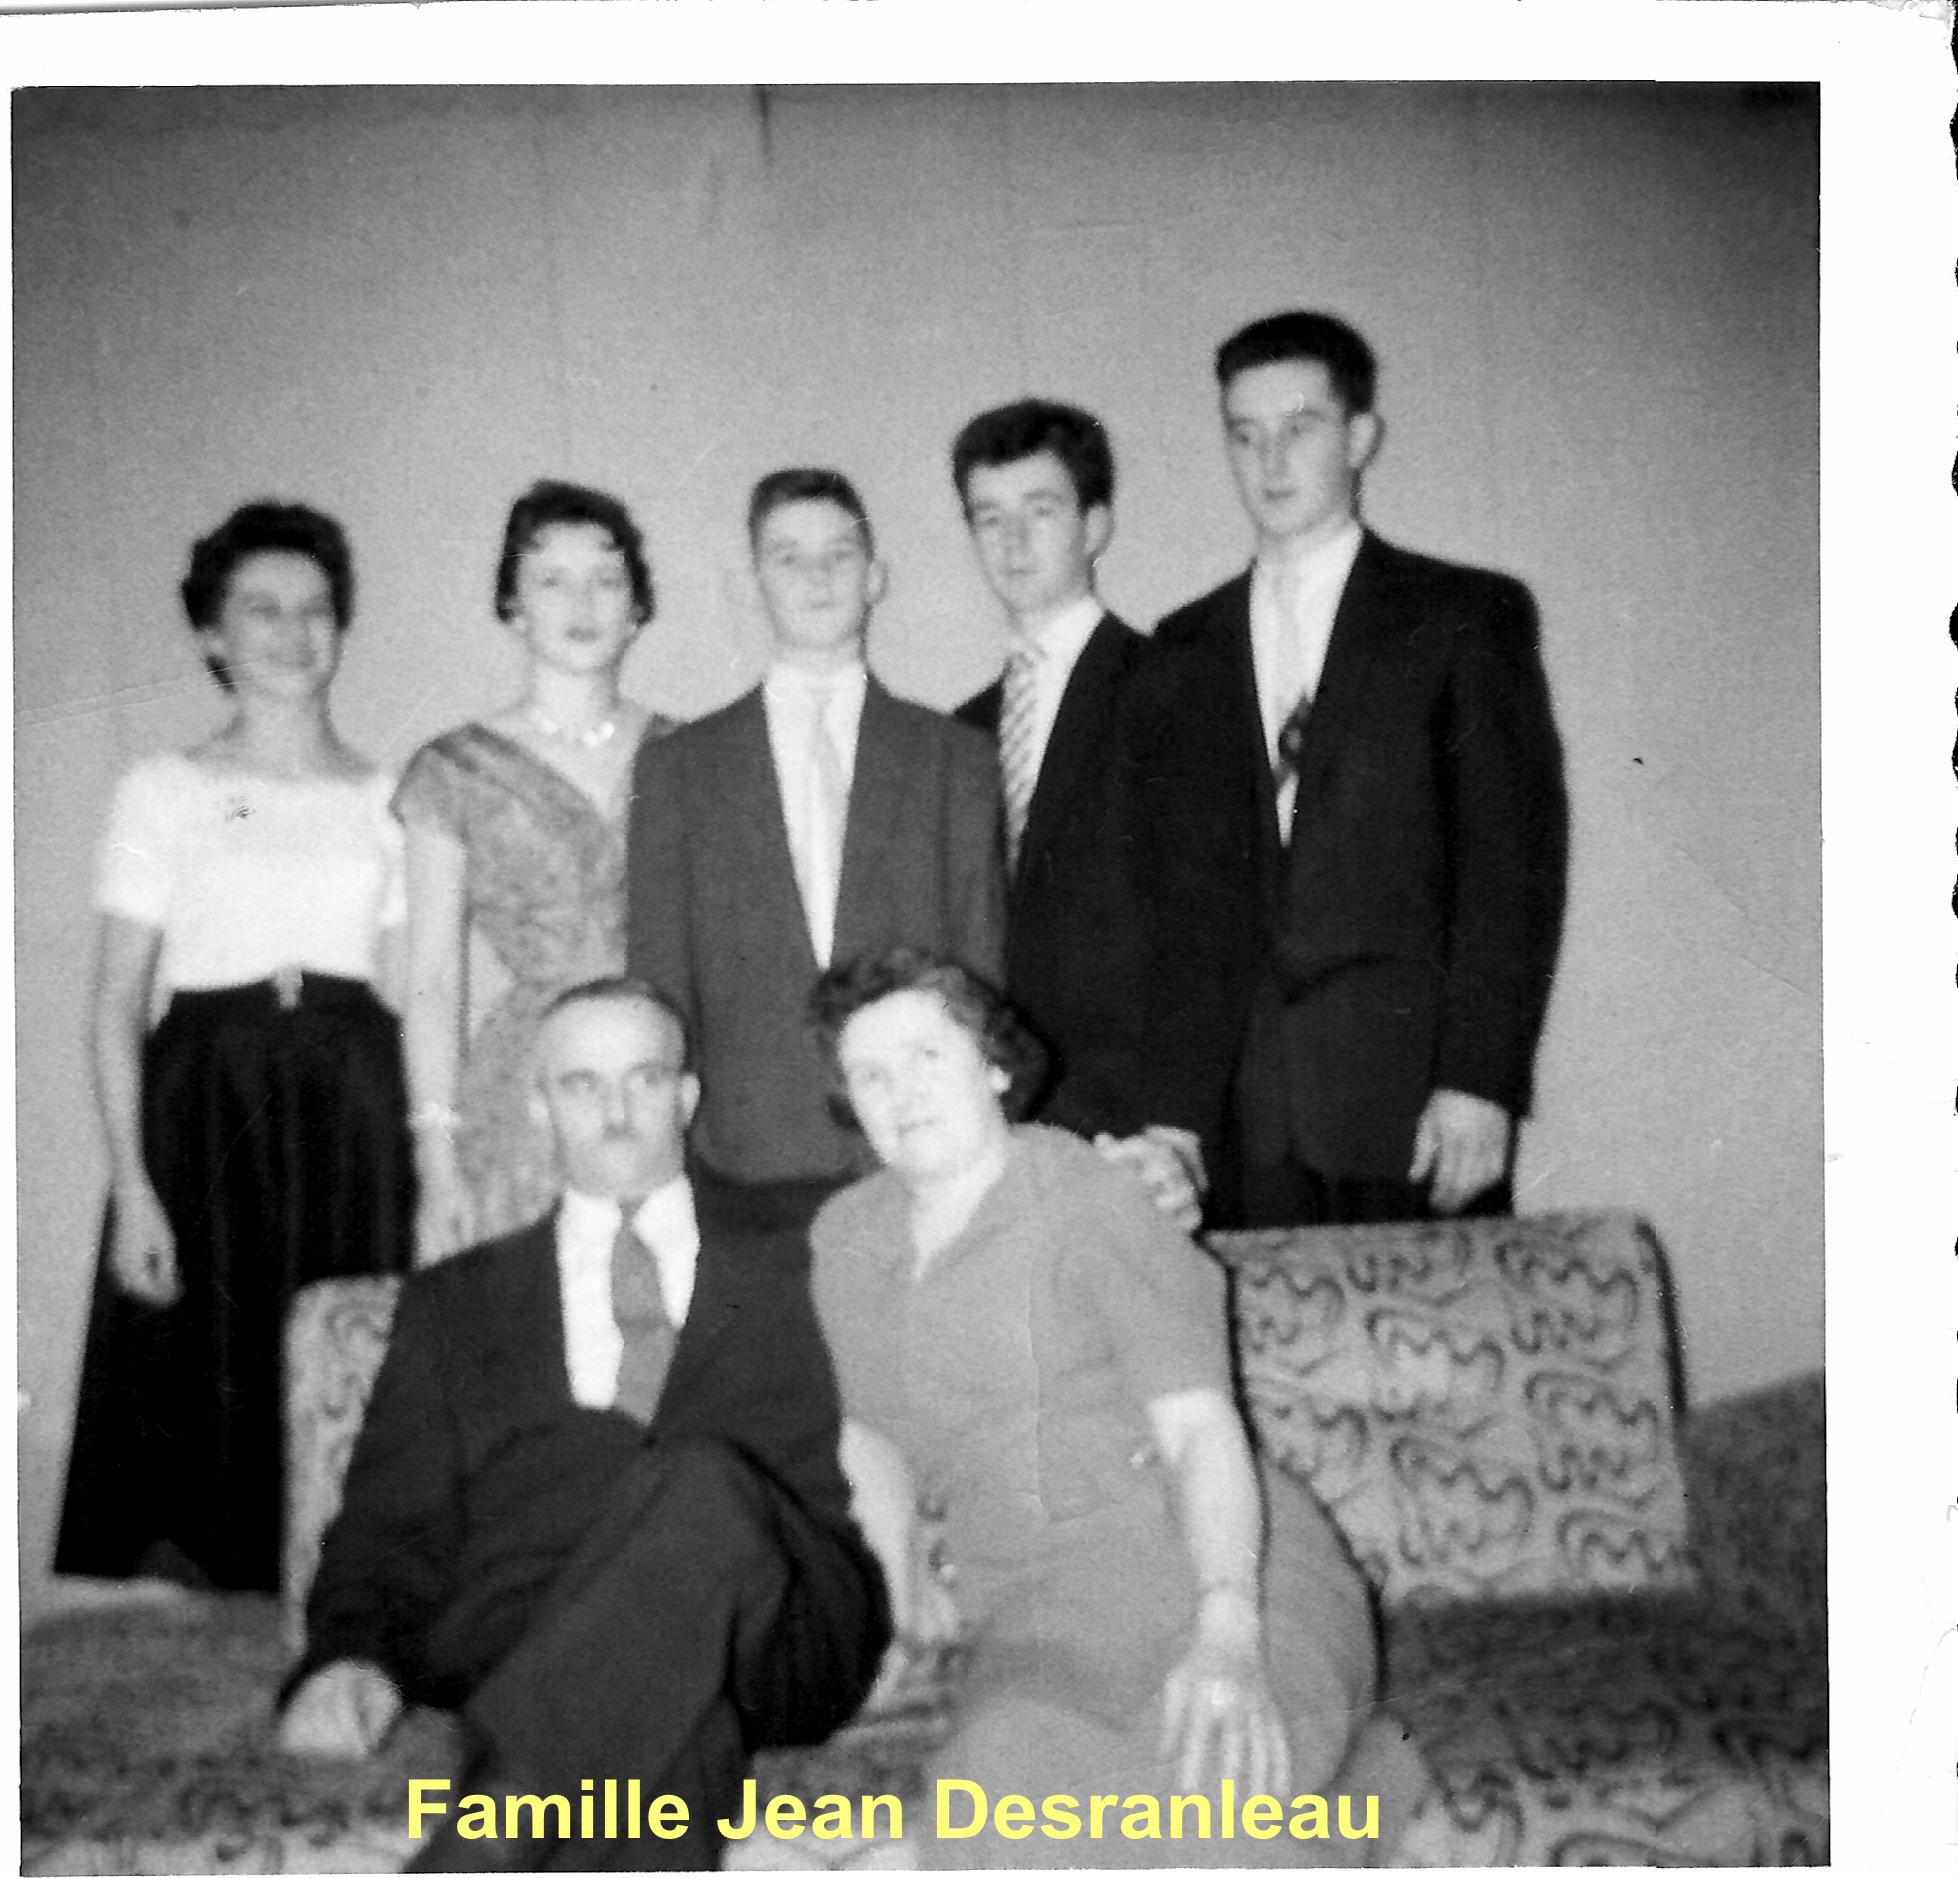 Famille Jean Desranleau